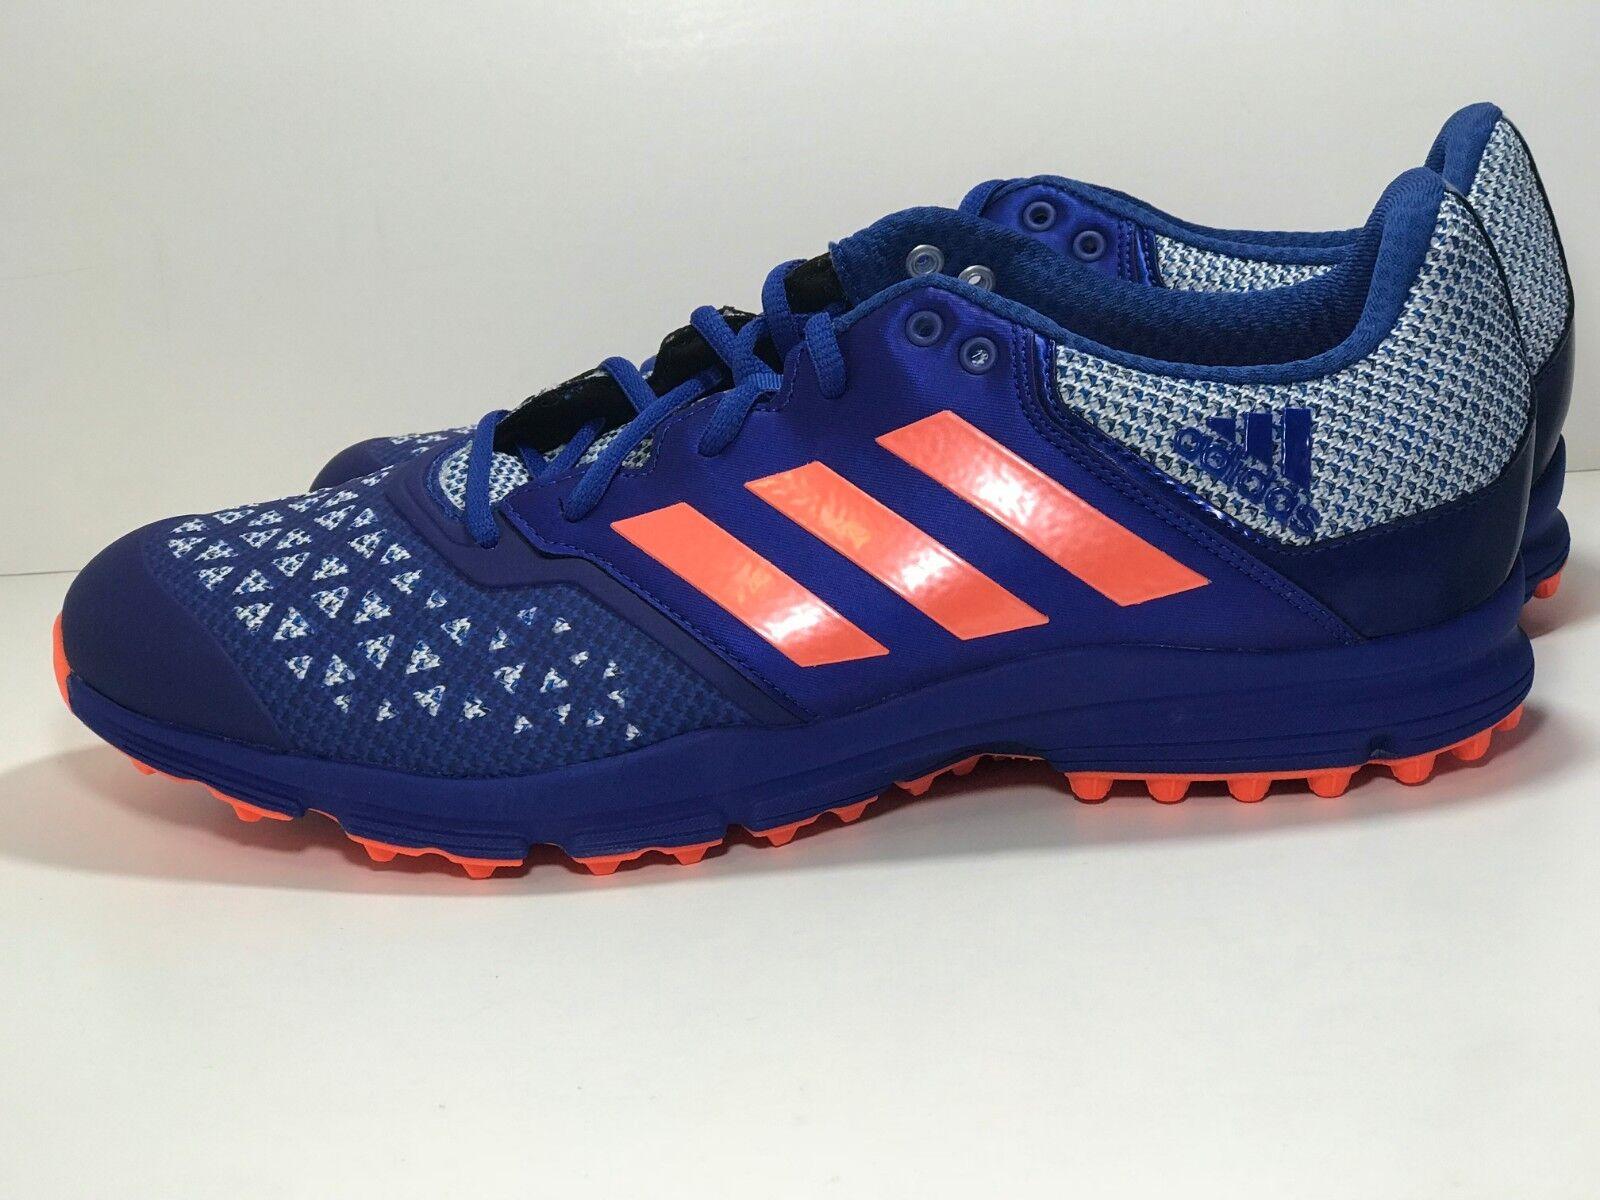 Adidas Zone AQ6520 Dox Hockey Shoe Blue Orange Trainers Cleats AQ6520 Zone Men's Size 12 9ed02f